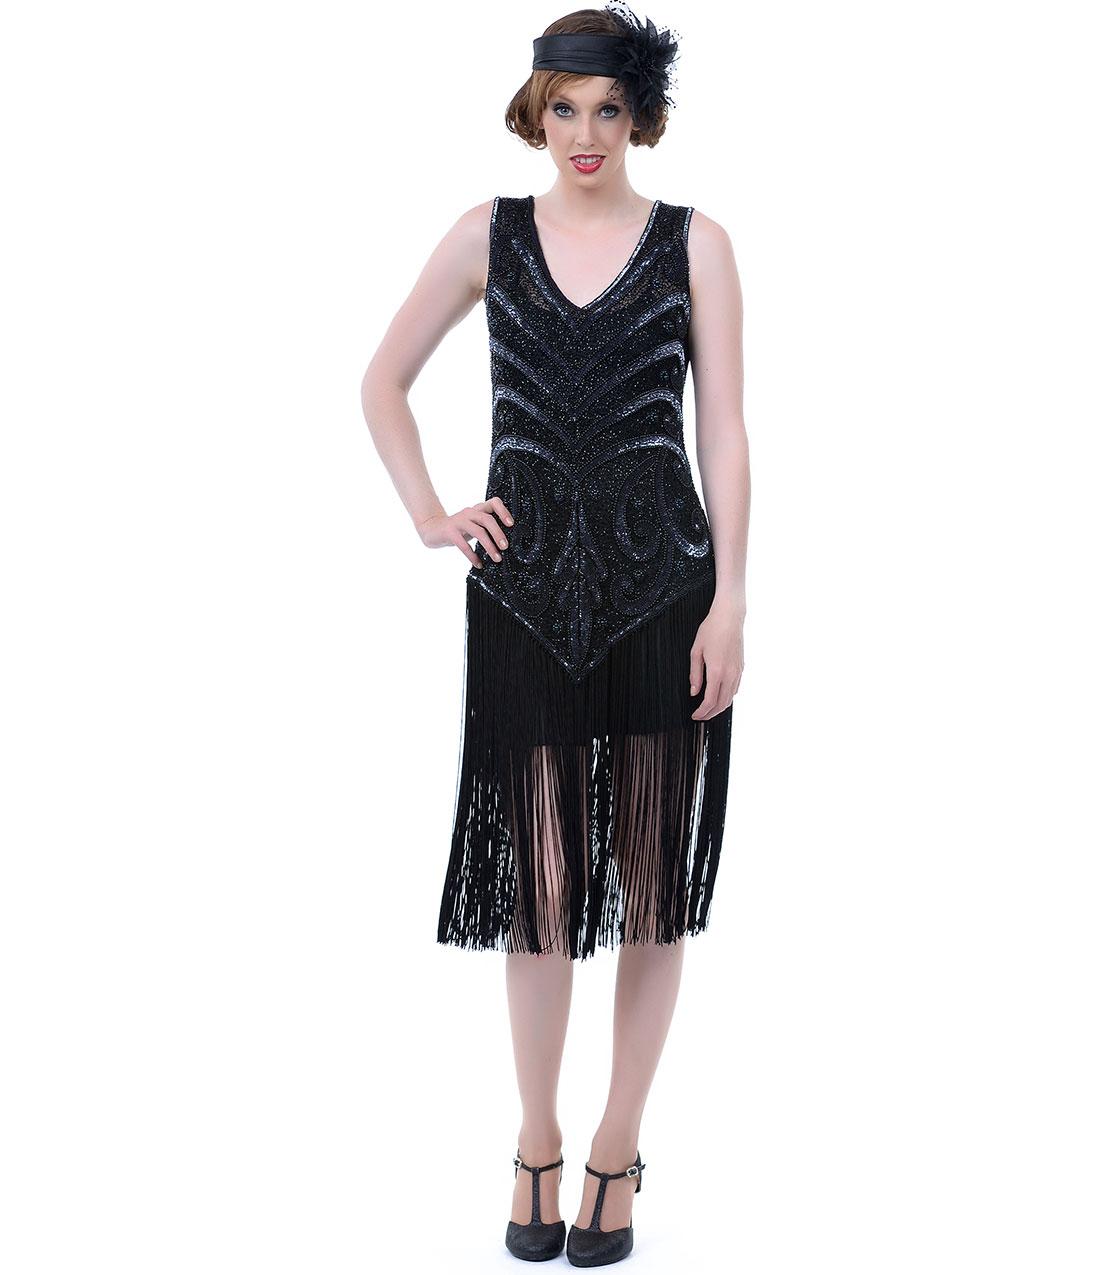 1920s Drop Waist Dress Dressedupgirl Com